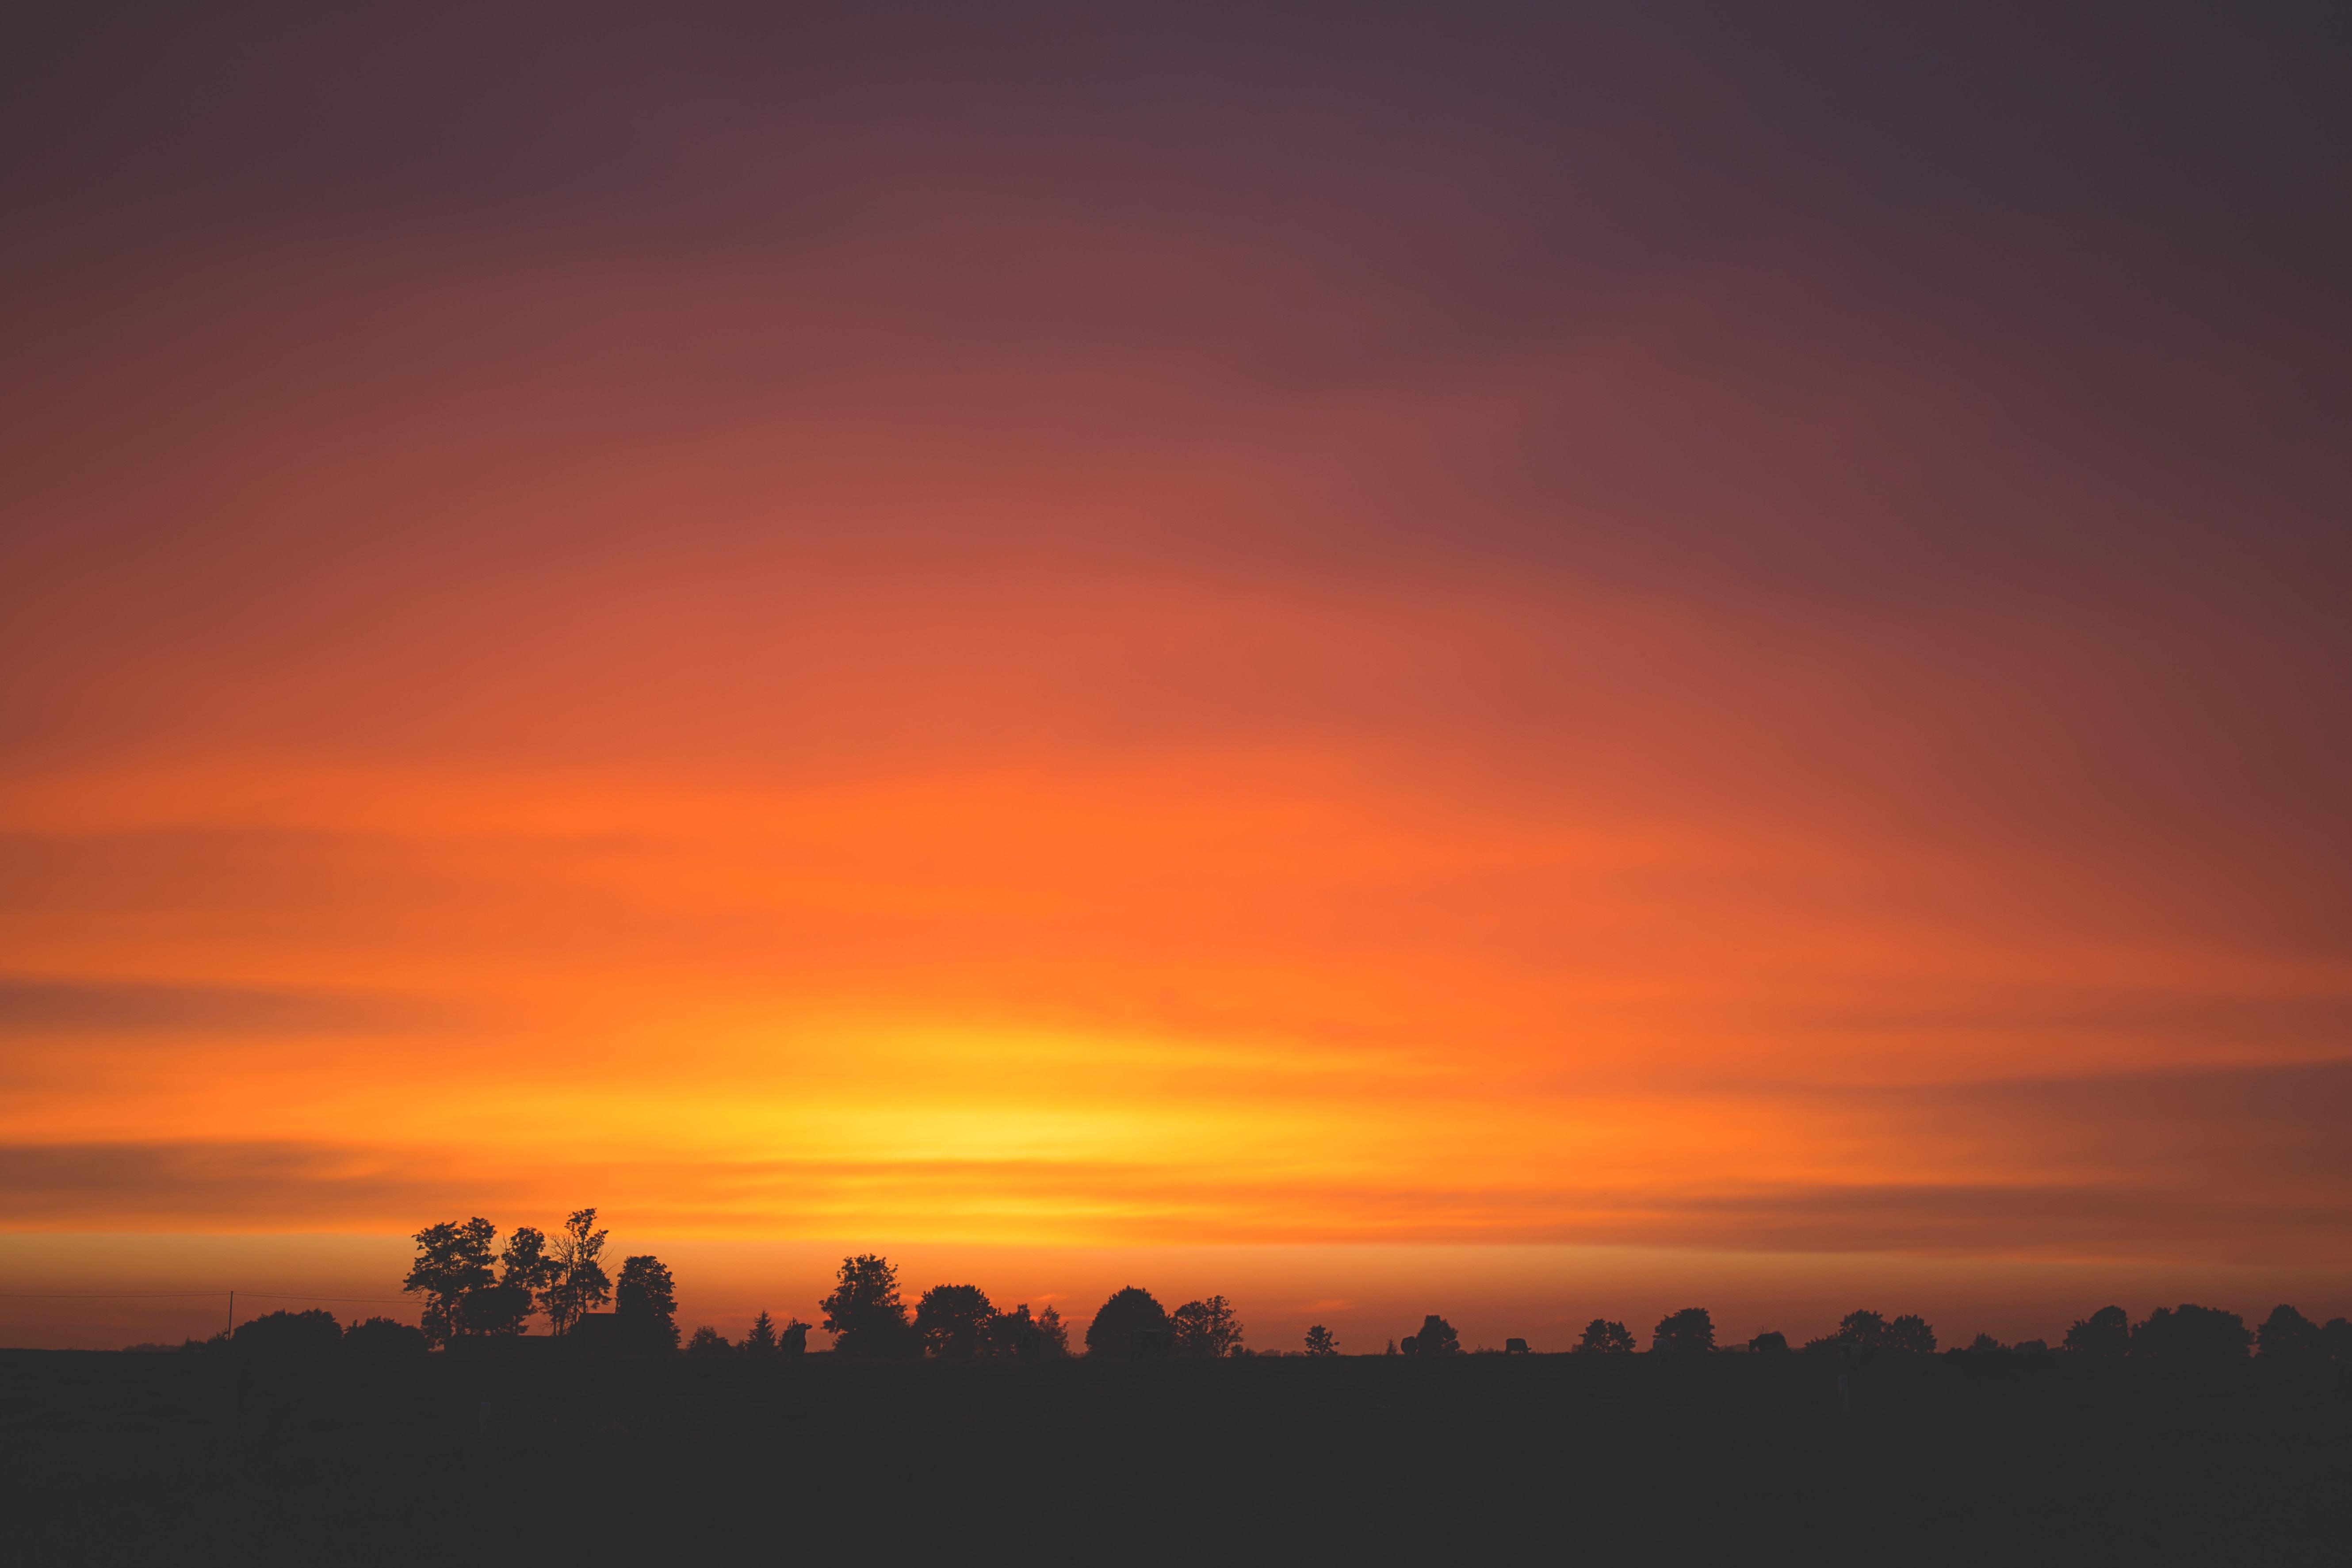 Dark silhouettes of trees against the twilight skies